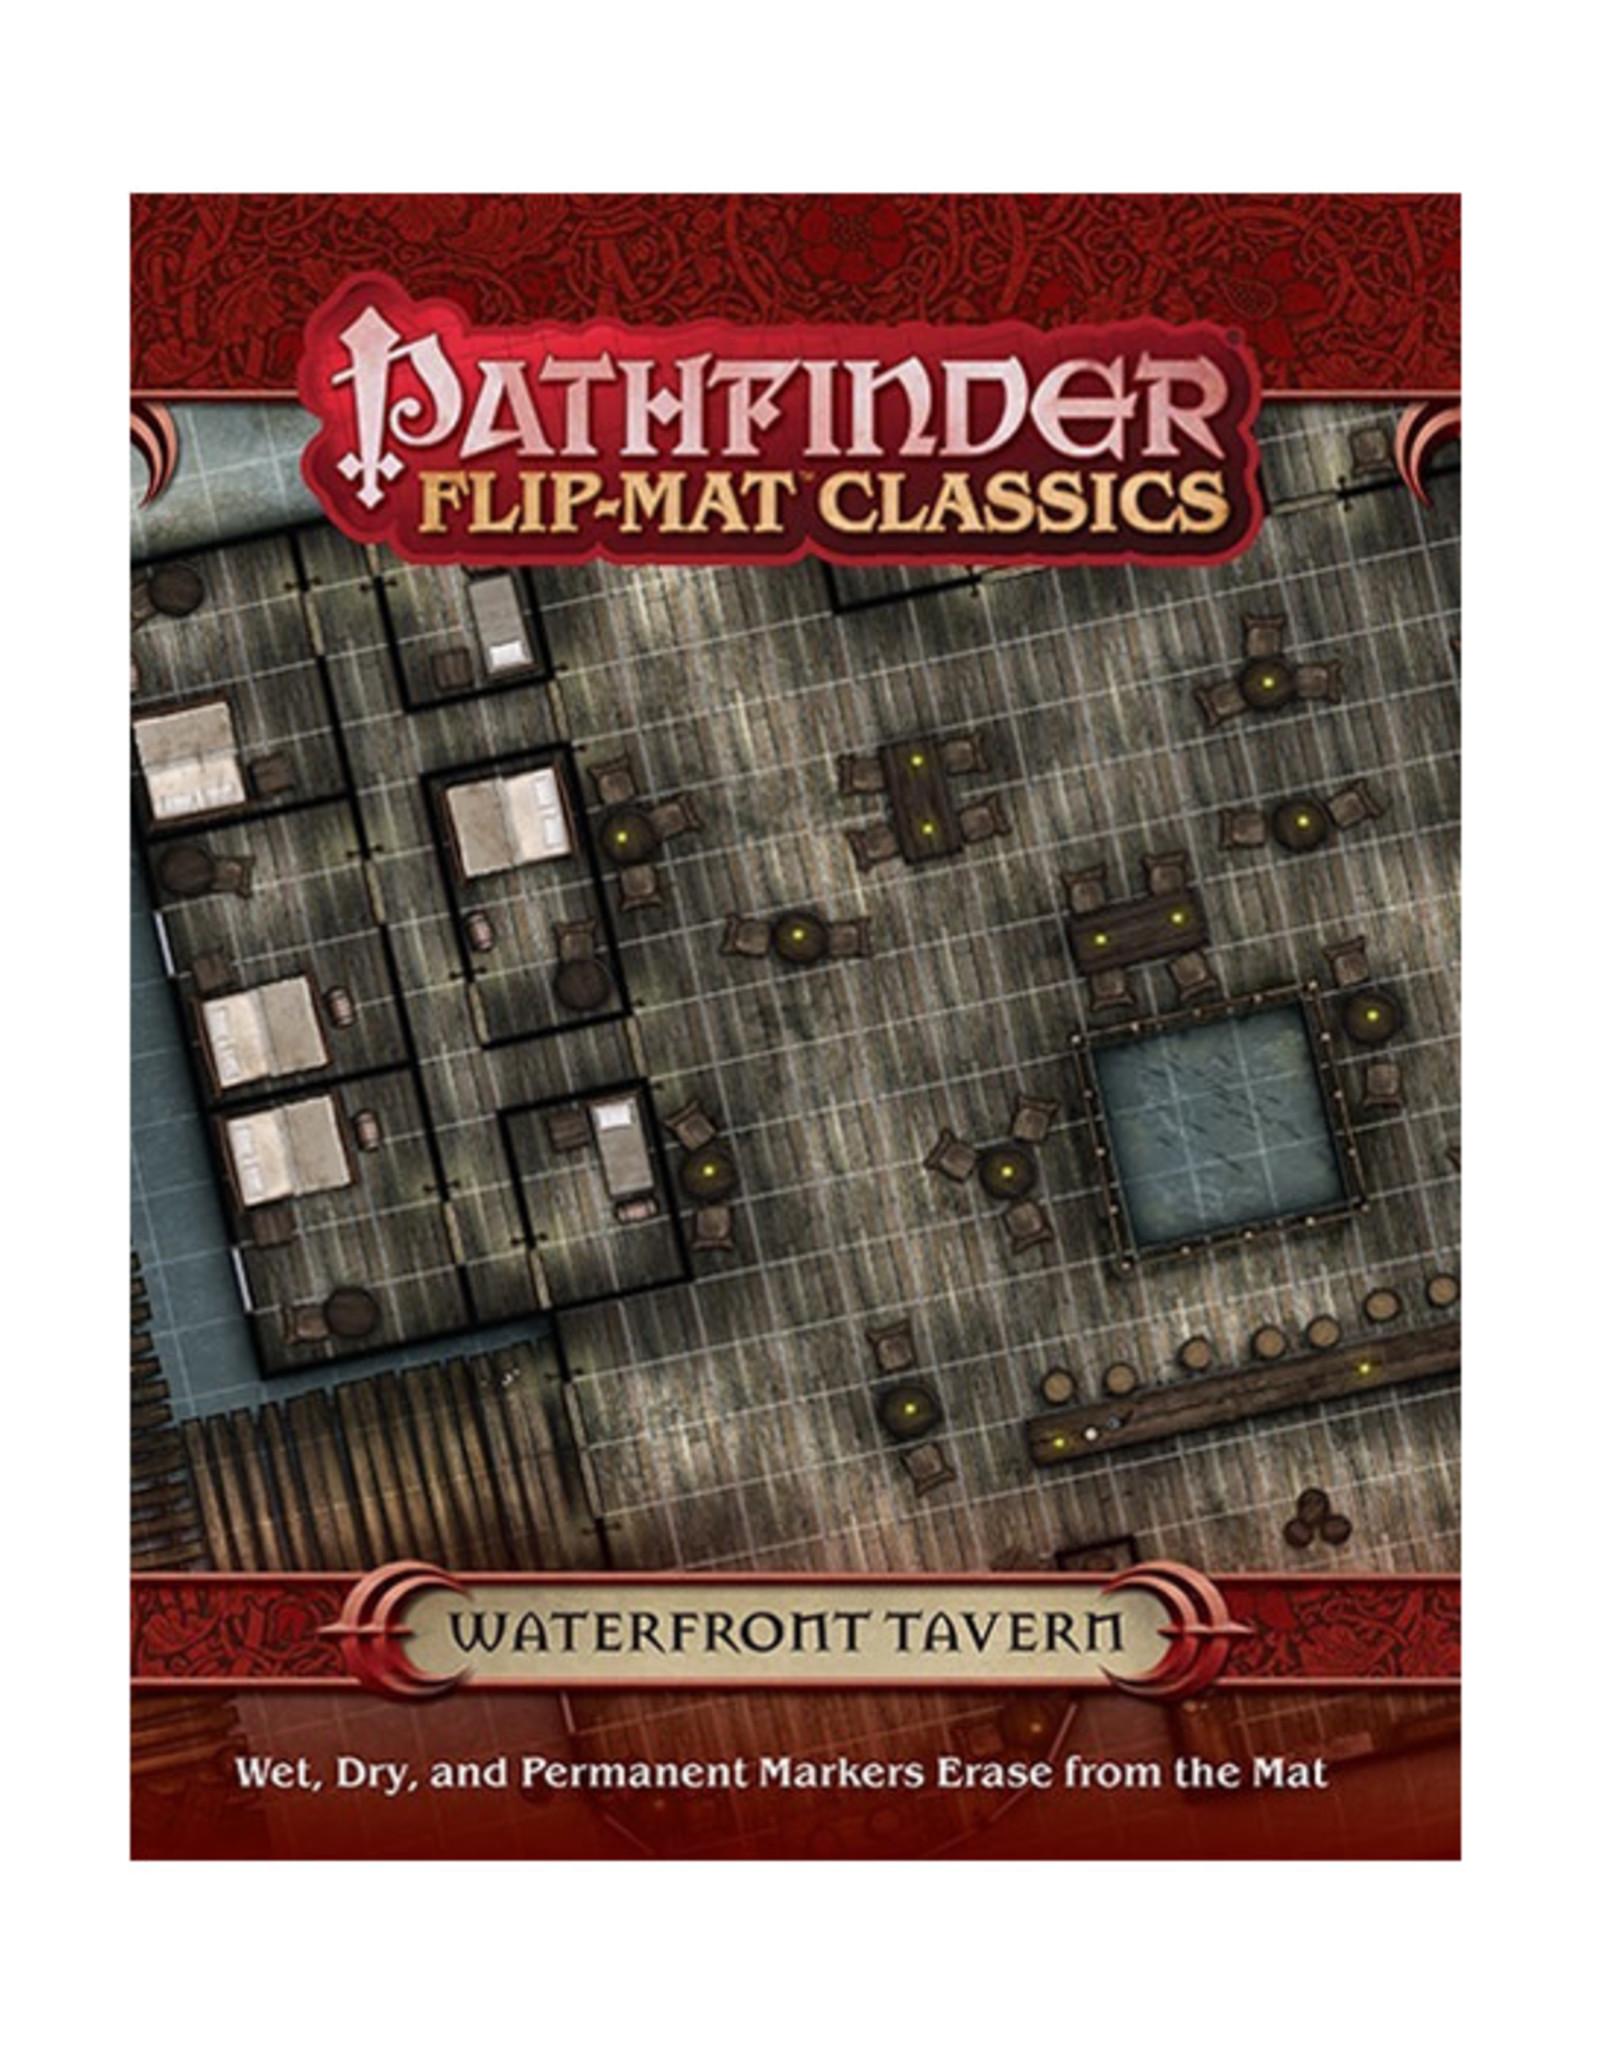 Pathfinder Pathfinder: Flip-Mat Classics - Waterfront Tavern